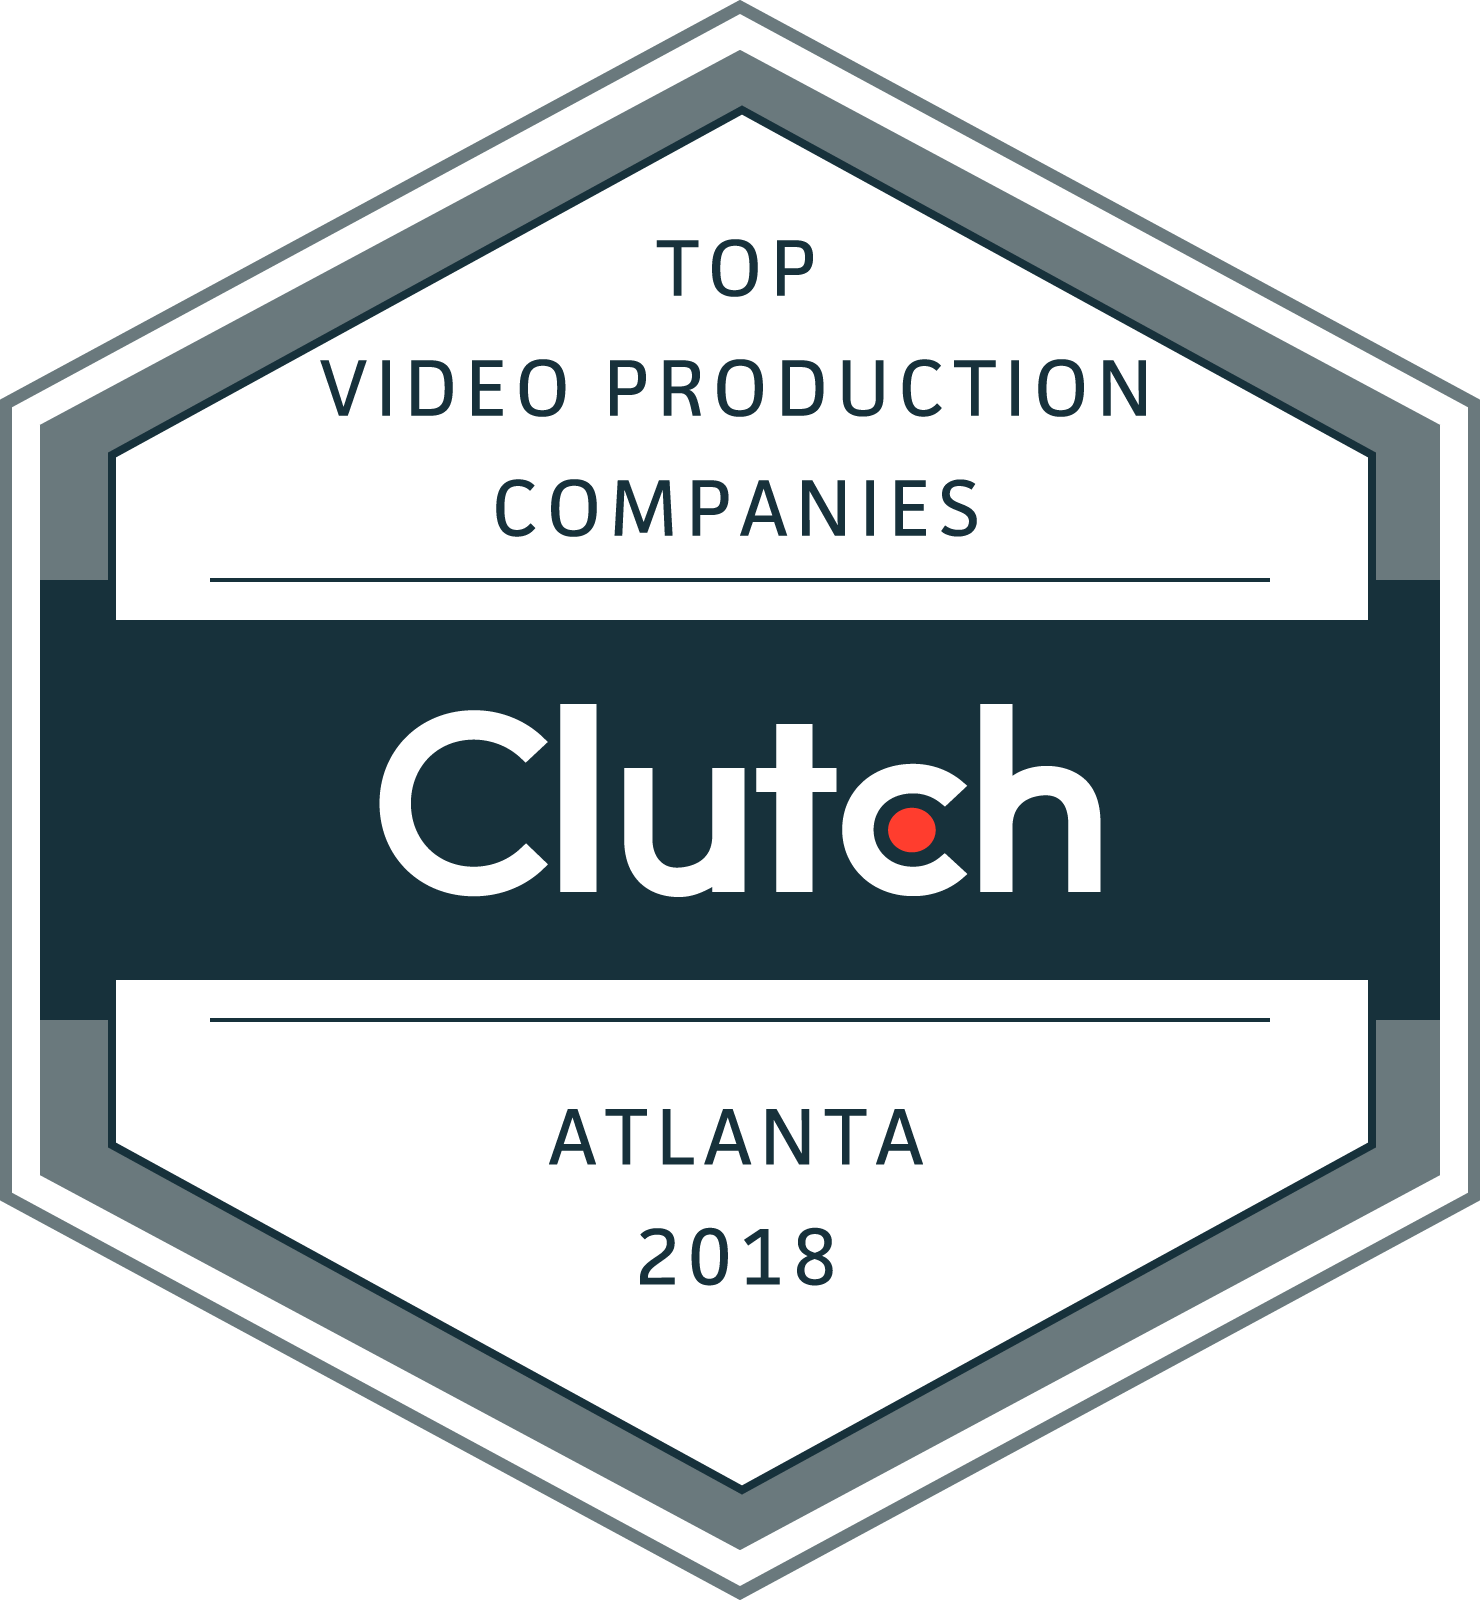 Video_Production_Companies_Atlanta_2018.png